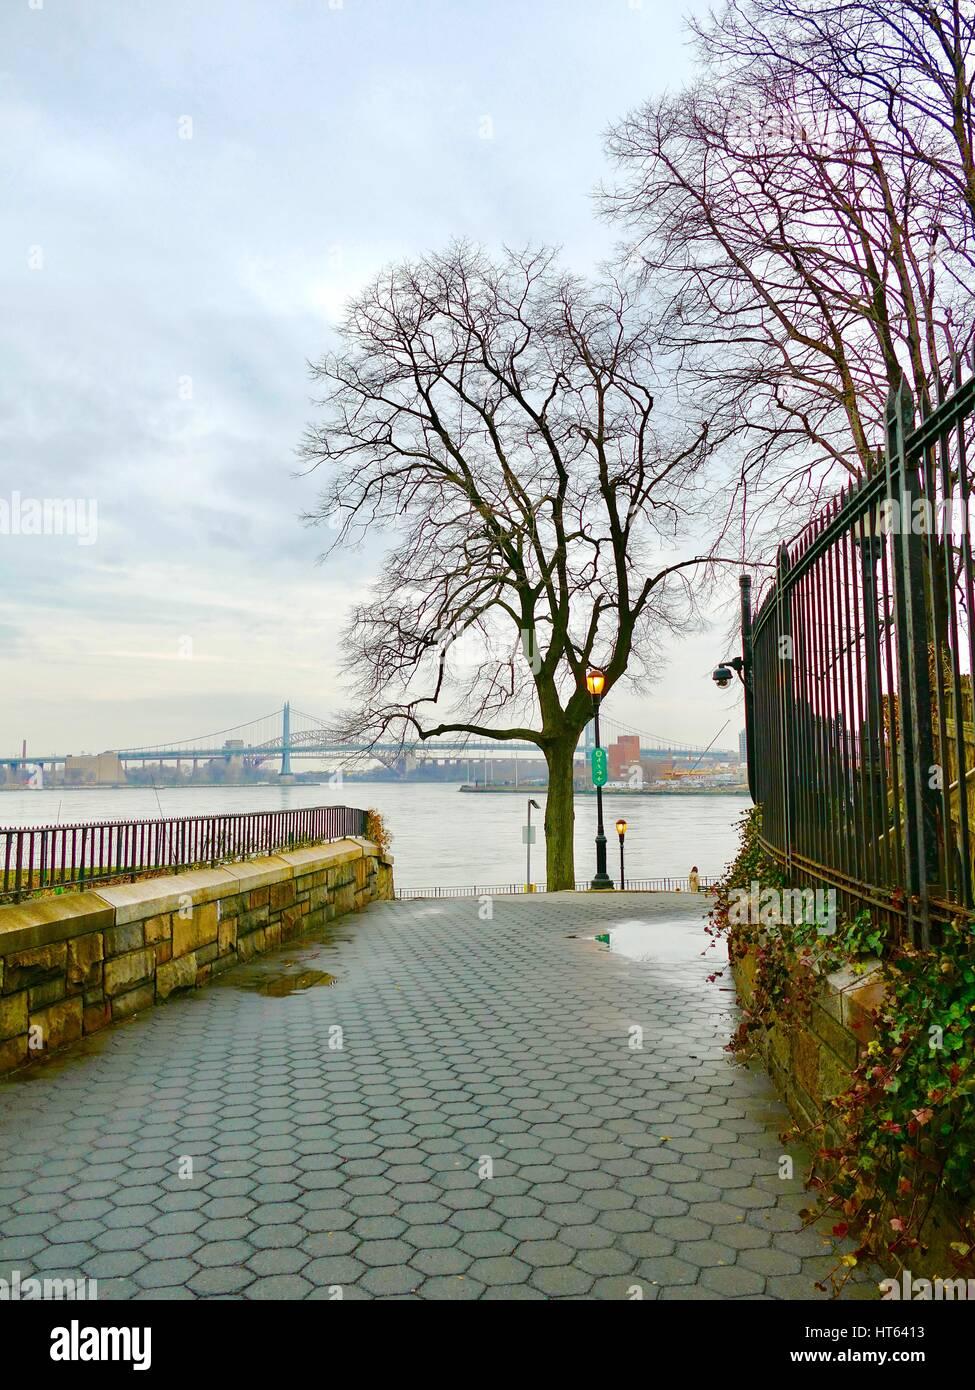 Looking across the East River towards the RFK bridge on a gray, rainy day. New York City, New York, USA - Stock Image